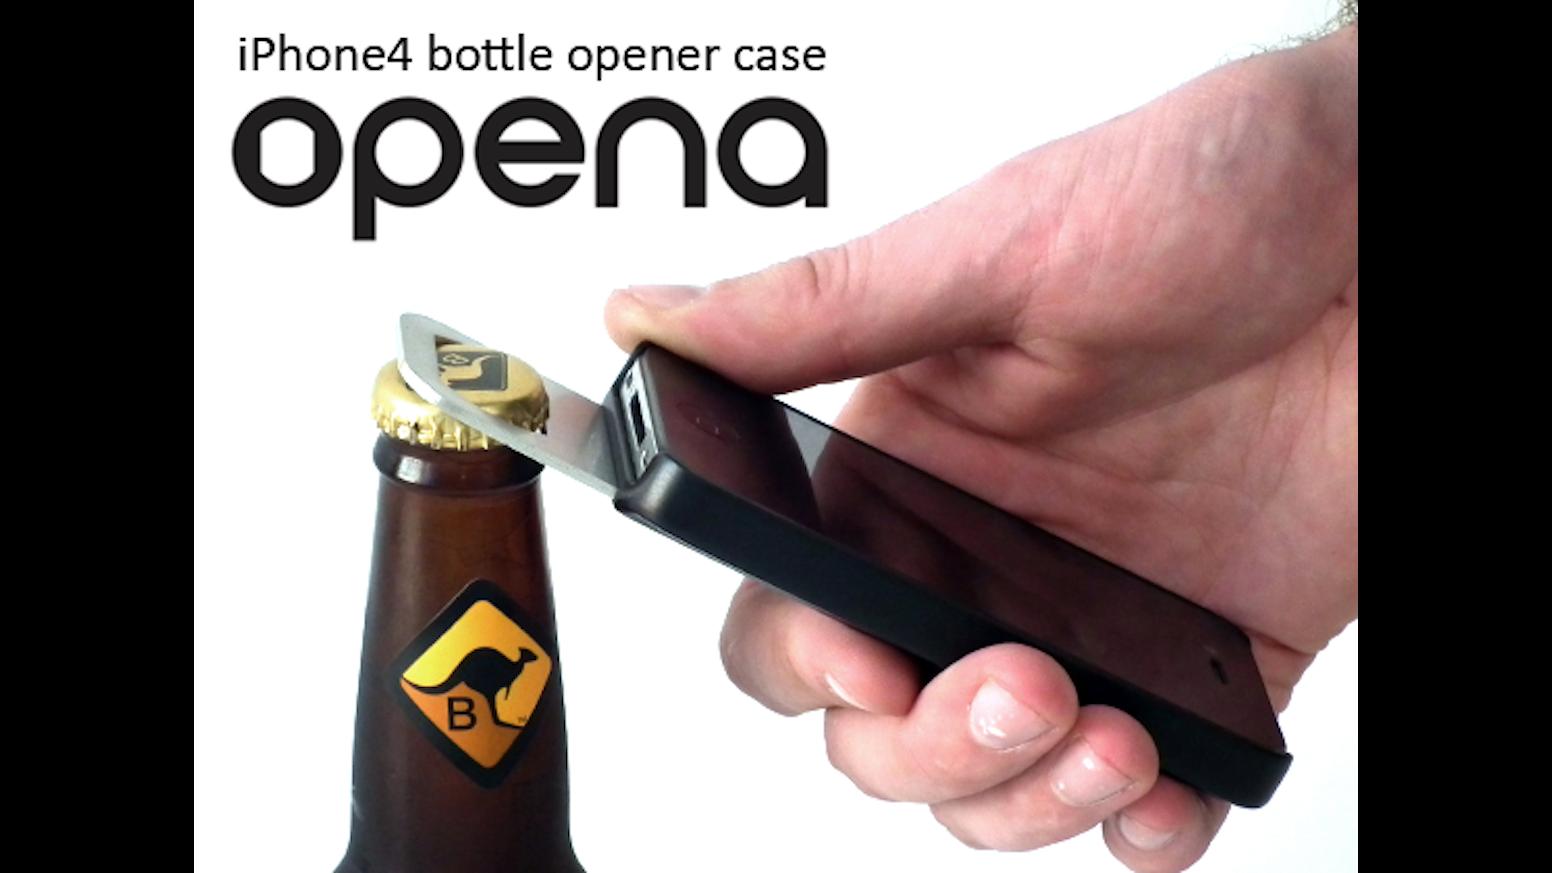 opena iphone bottle opener case by rob ward chris peters kickstarter. Black Bedroom Furniture Sets. Home Design Ideas